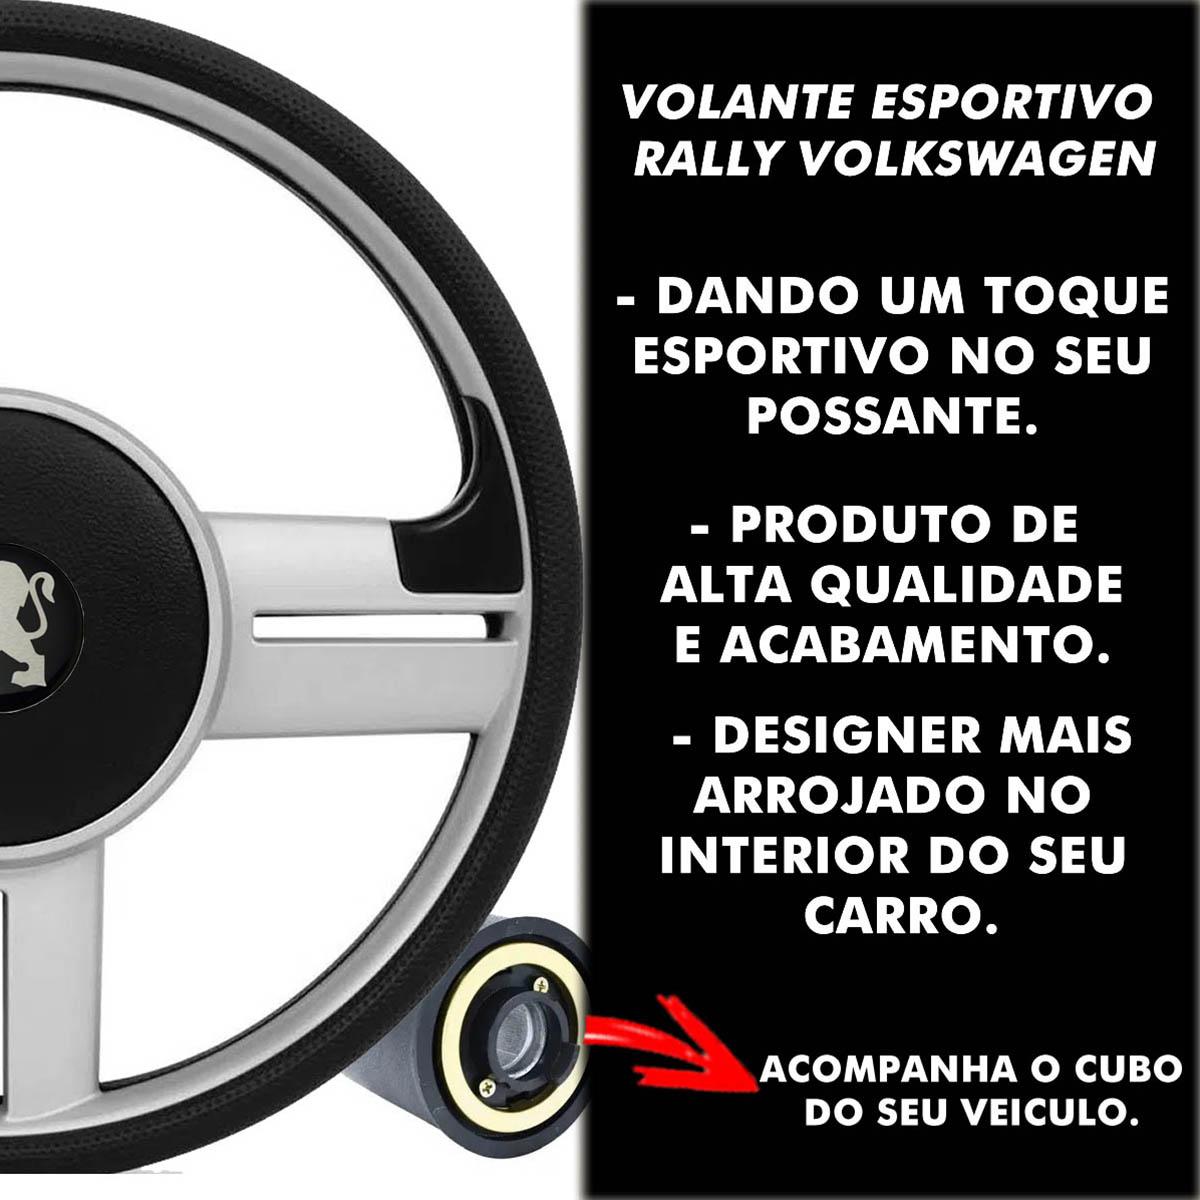 Volante Peugeot Surf Rallye Esportivo Cubo 106 206 306 Sw Poliparts